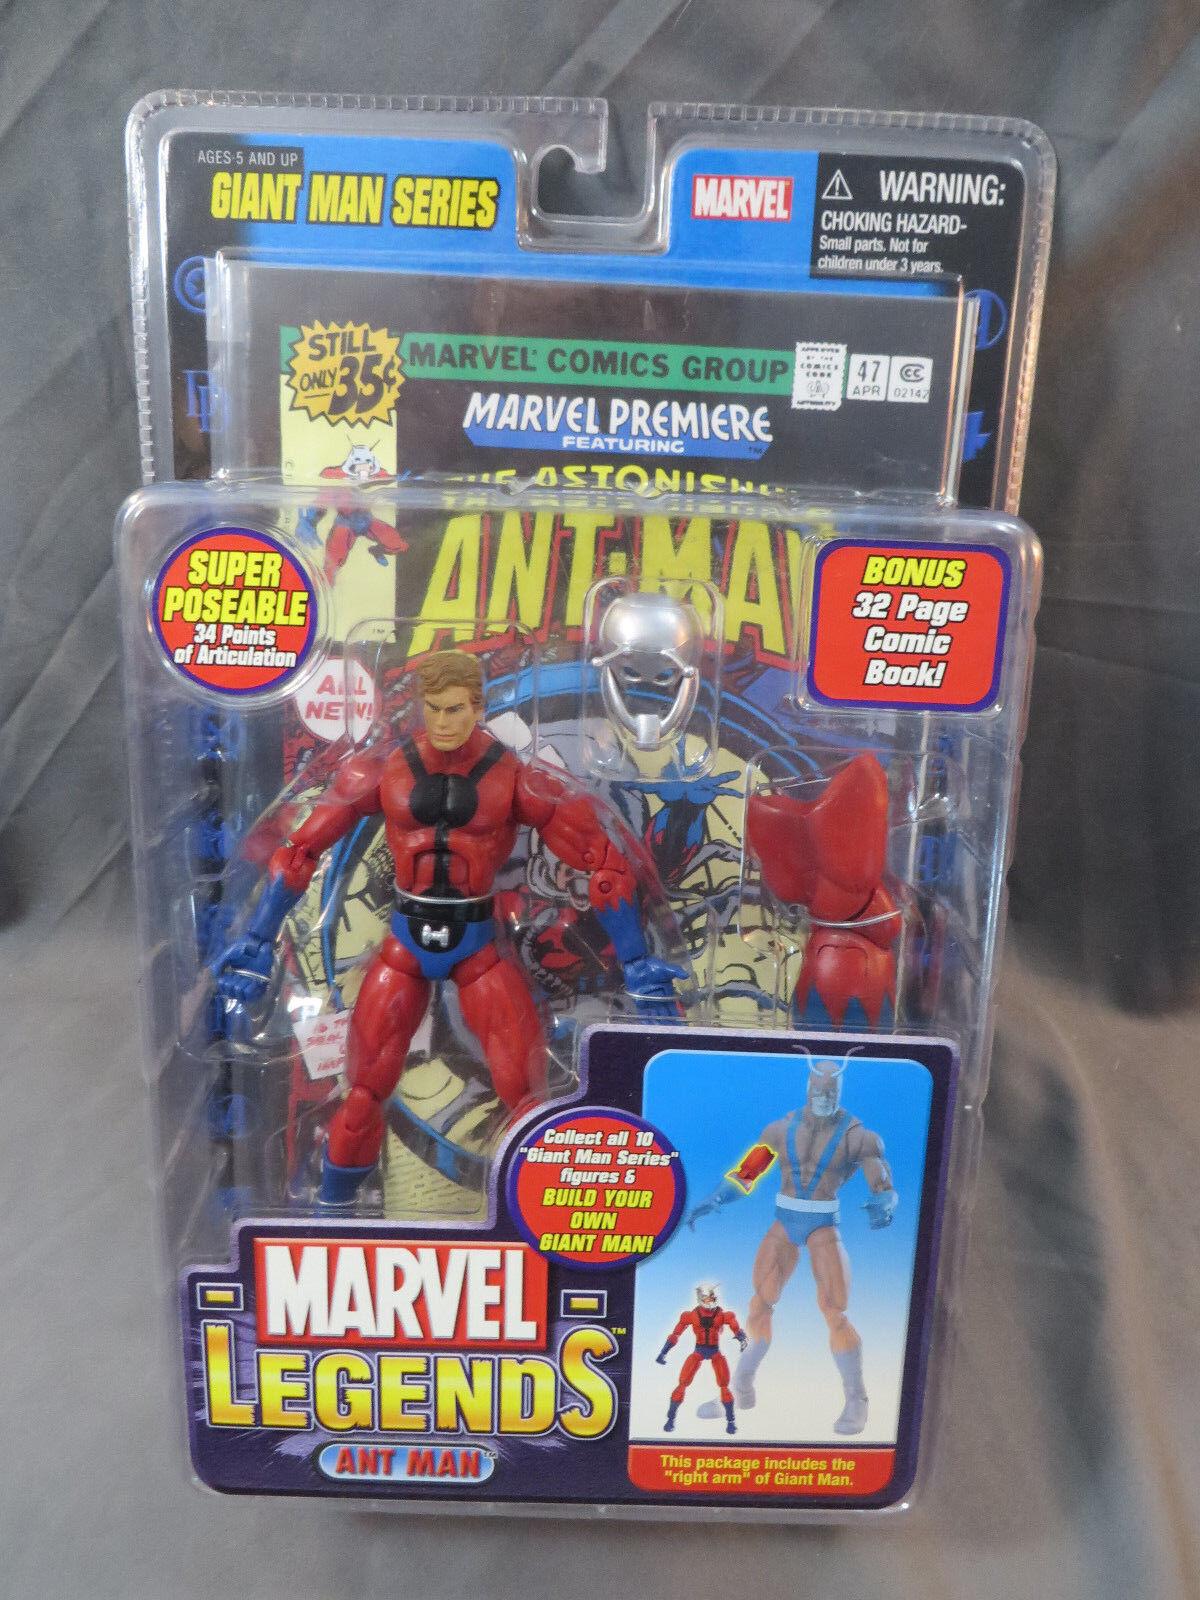 ToyBiz Marvel Legends Ant Man Giant Man Series MOC 6  Avengers Action Figure